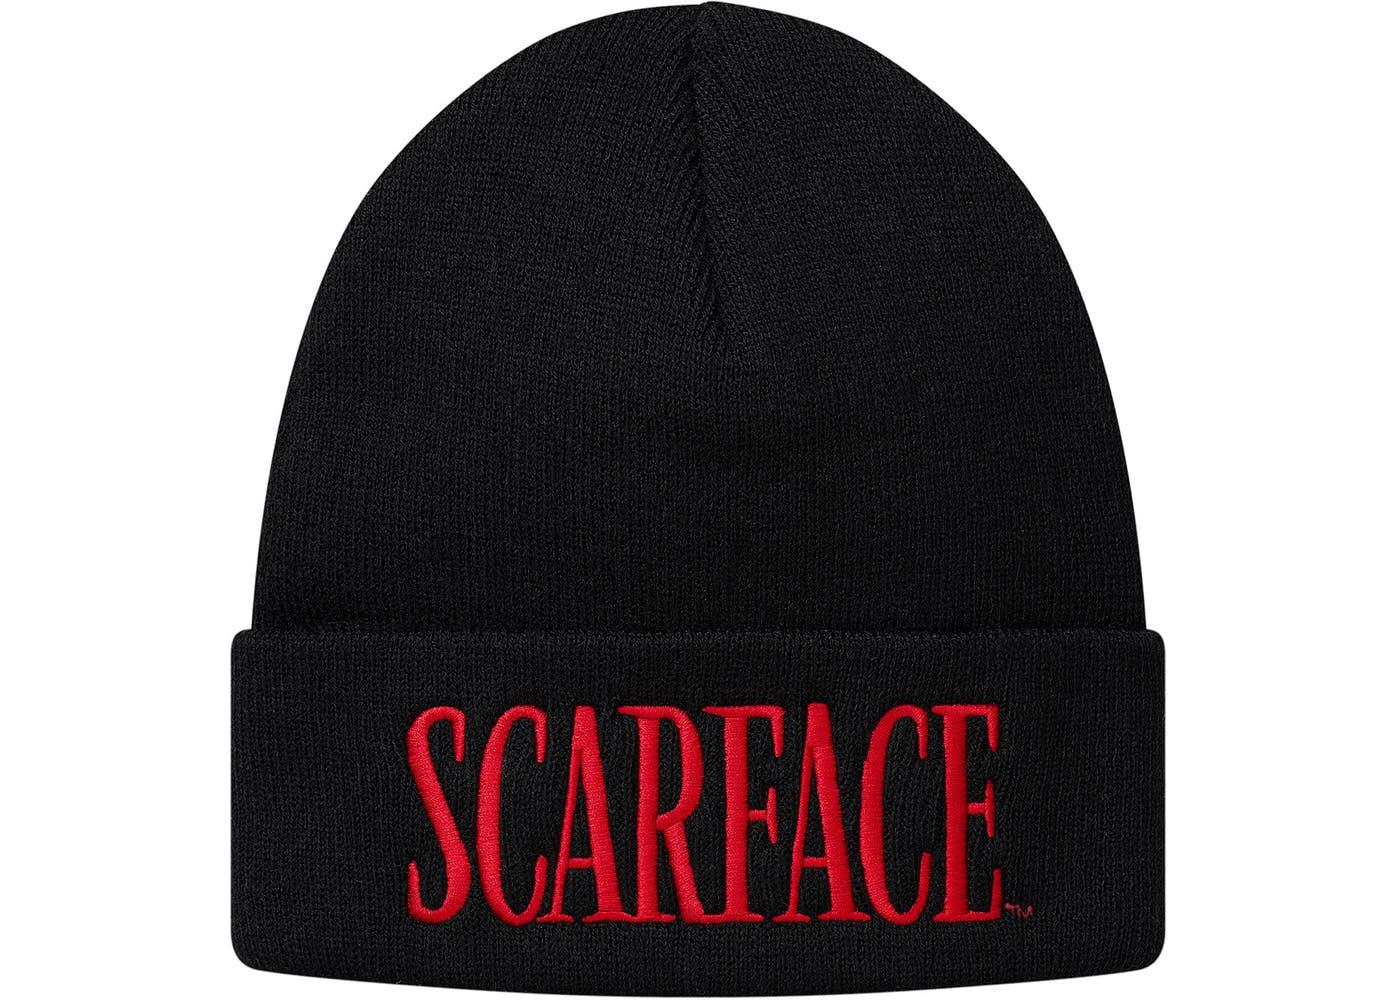 9ea6de100402e Black Supreme Scarface Beanie - StockX News